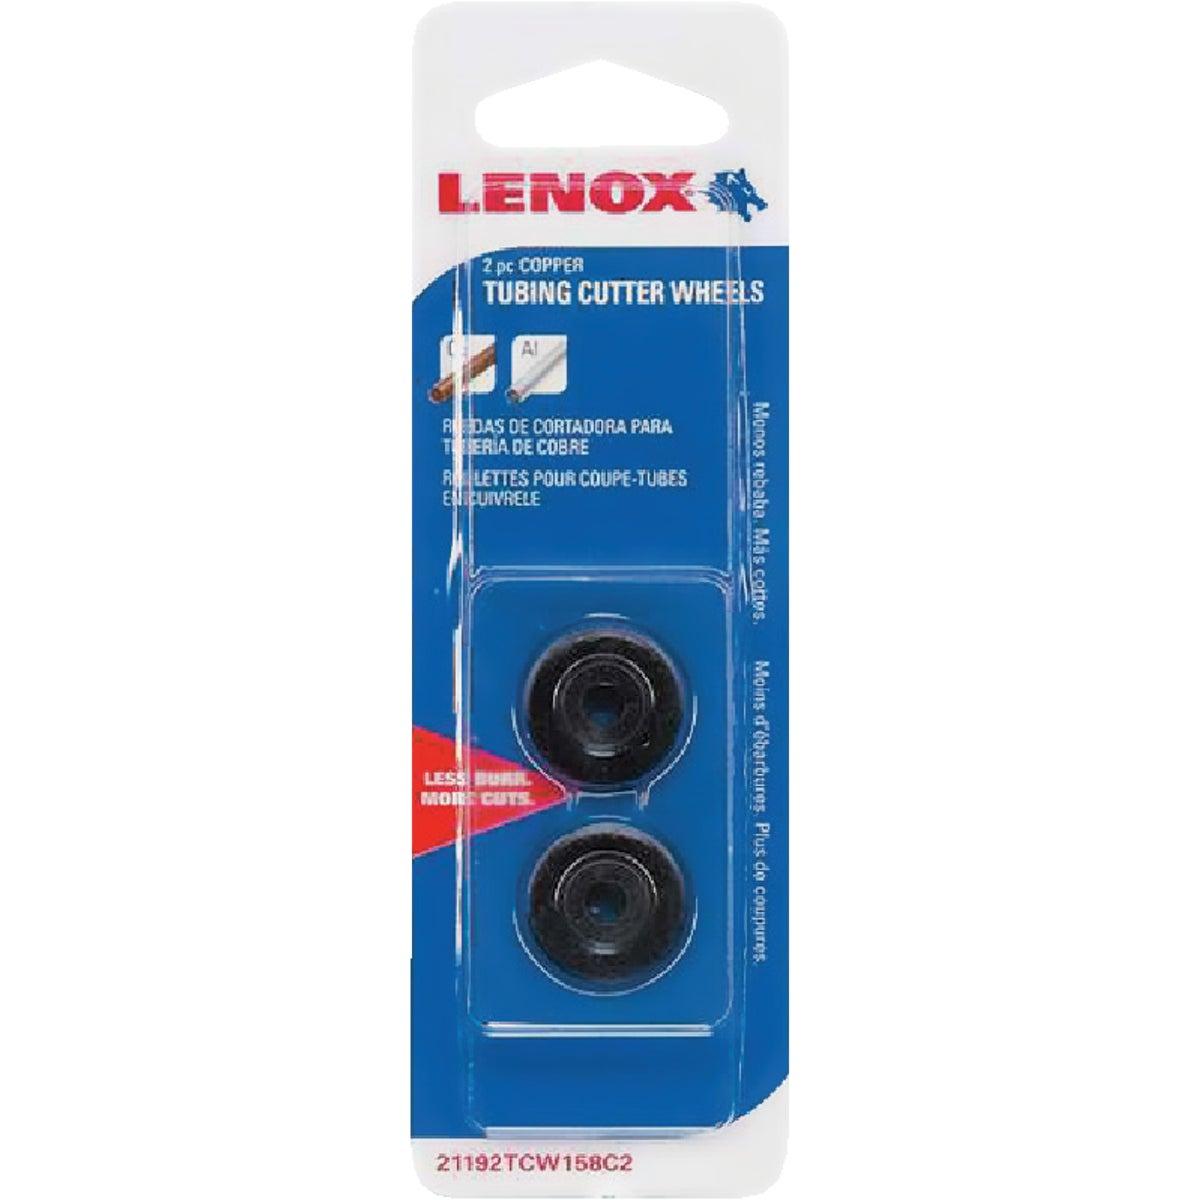 Lenox REPLACEMENT CUTTER WHEEL 21192-TCW158C2